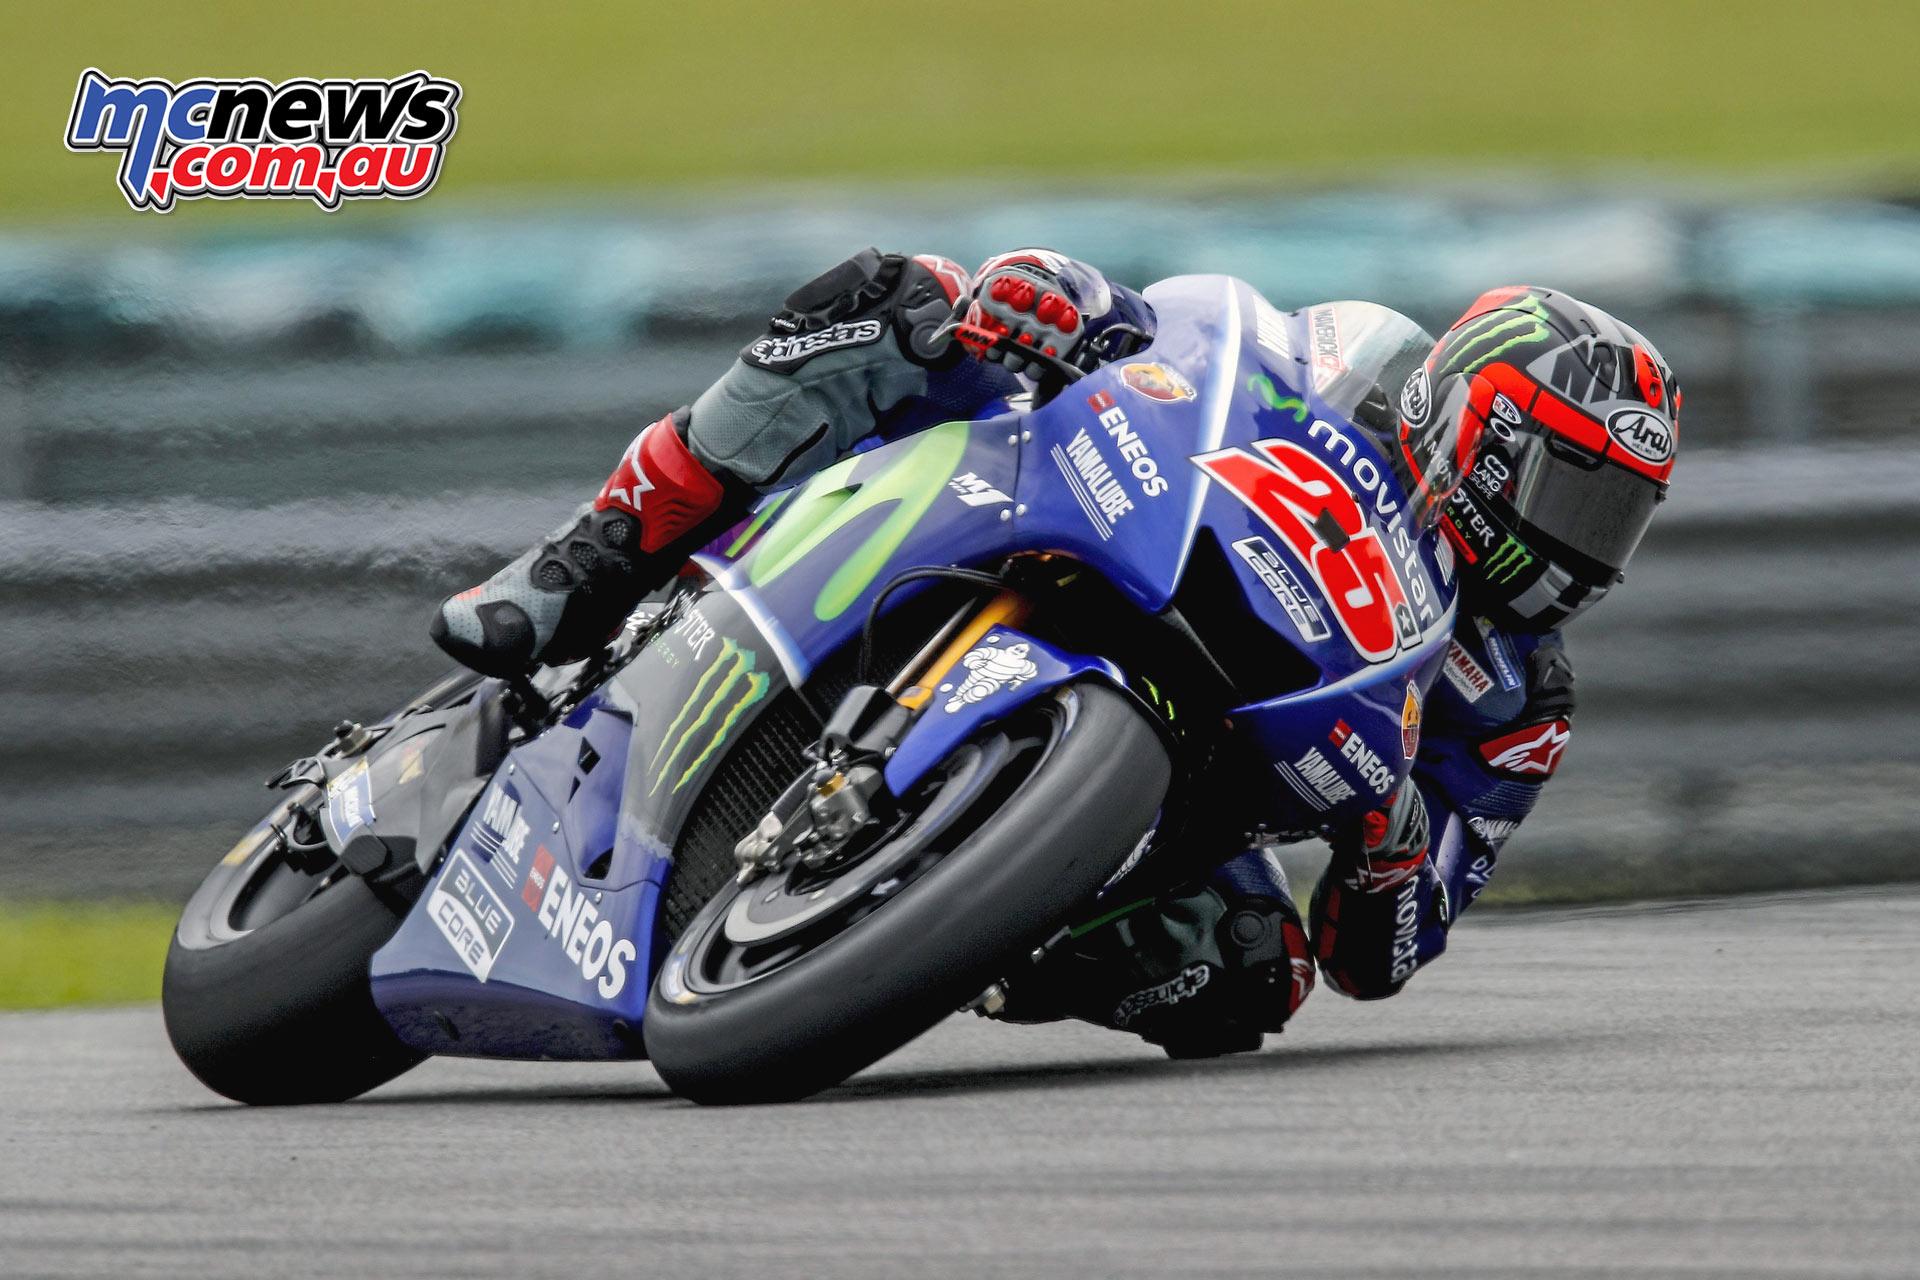 Andrea Iannone leads Sepang MotoGP Test Day Two | MCNews.com.au